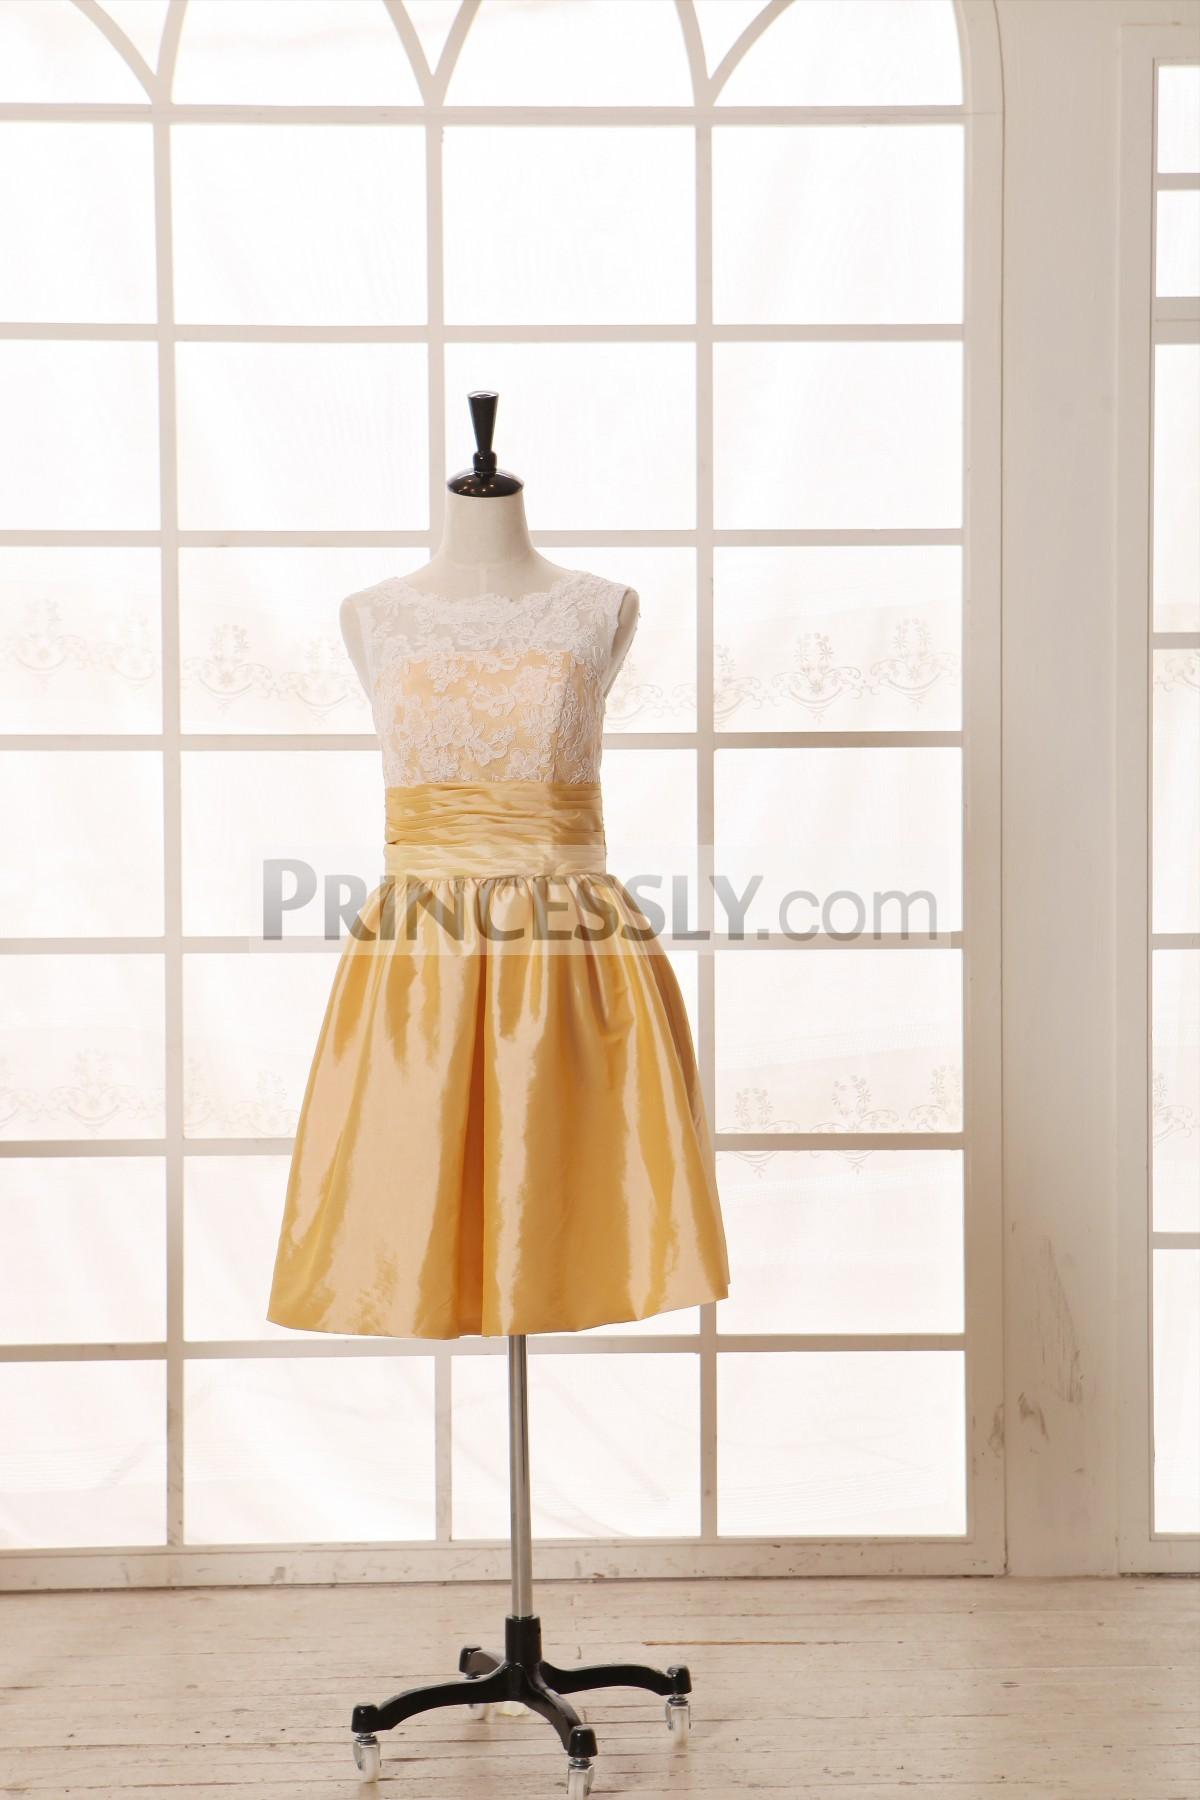 Princessly.com-K1001957-Vintage Ivory Lace Yellow Taffeta Bridesmaid Dress knee Short Length-31